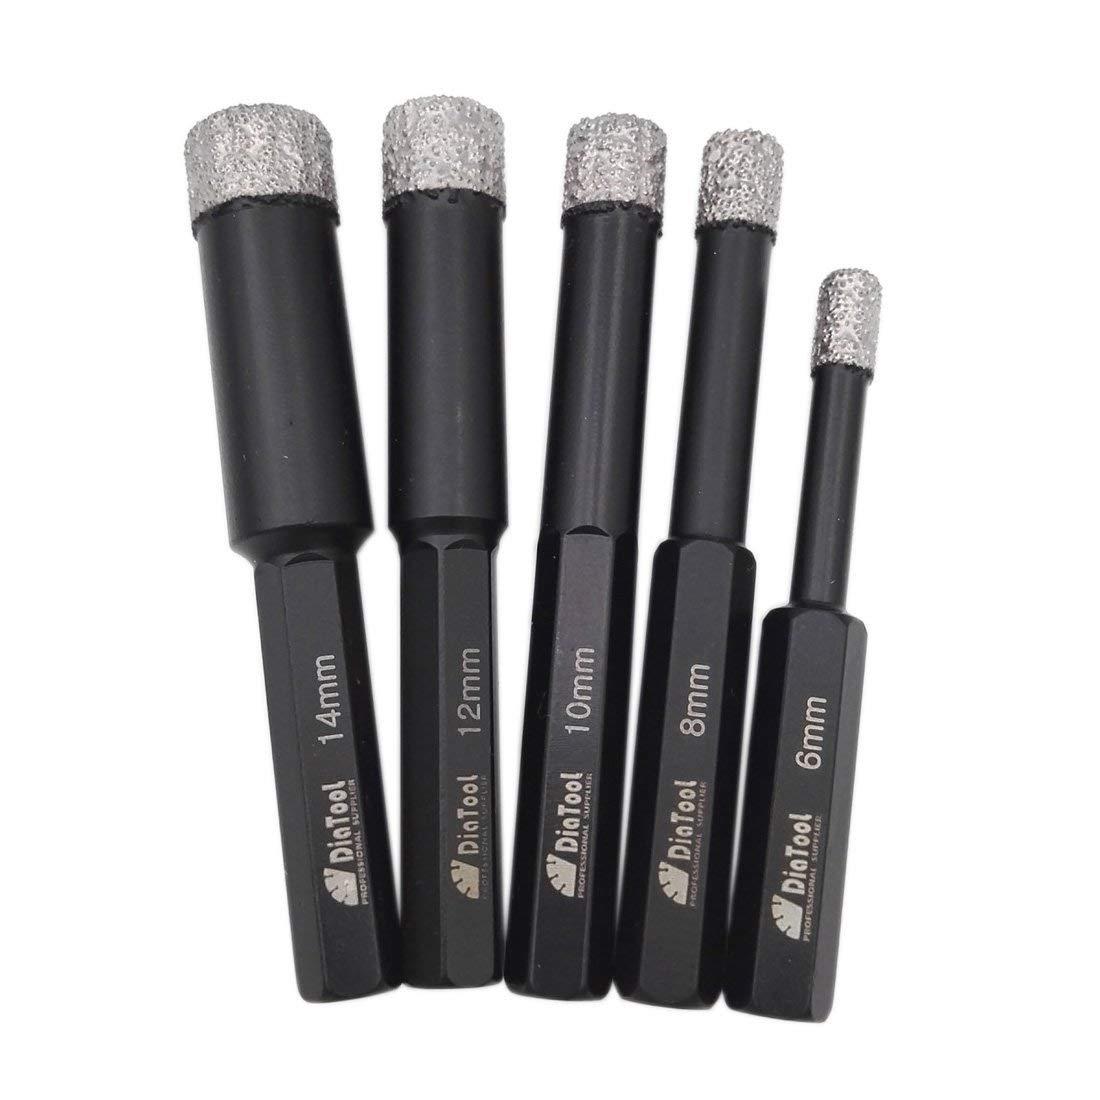 DIATOOL 5pcs/set Dry drilling bits with Hex shank for granite marble ceramic tile glass Vacuum Brazed diamond drill bits (6/8/10/12/14mm)